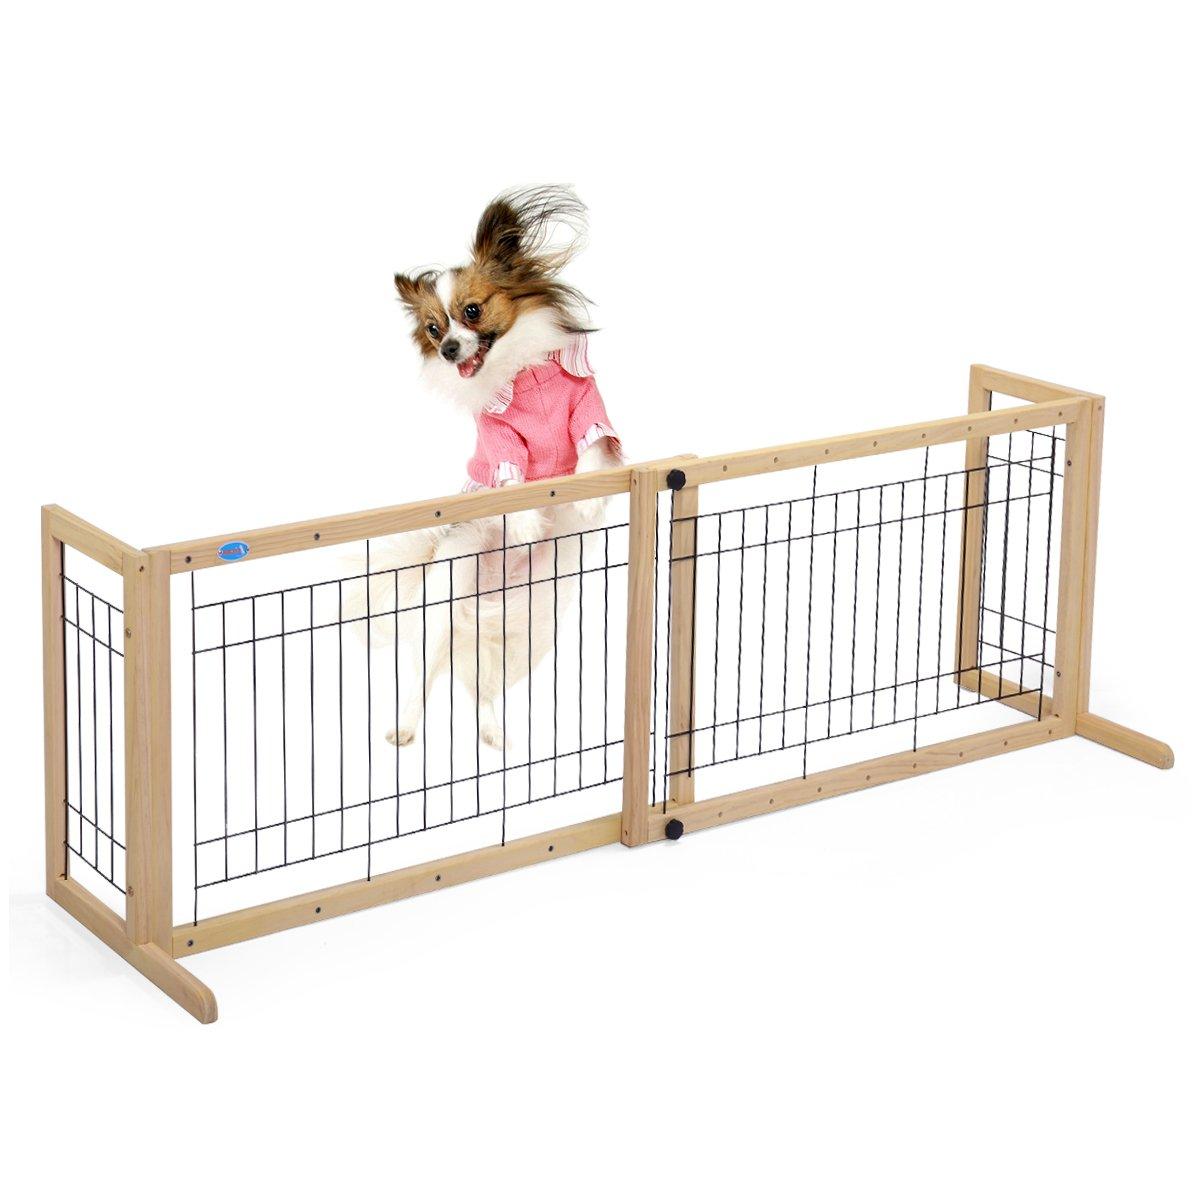 Cheap Diy Wood Fence Gate Find Diy Wood Fence Gate Deals On Line At Alibaba Com